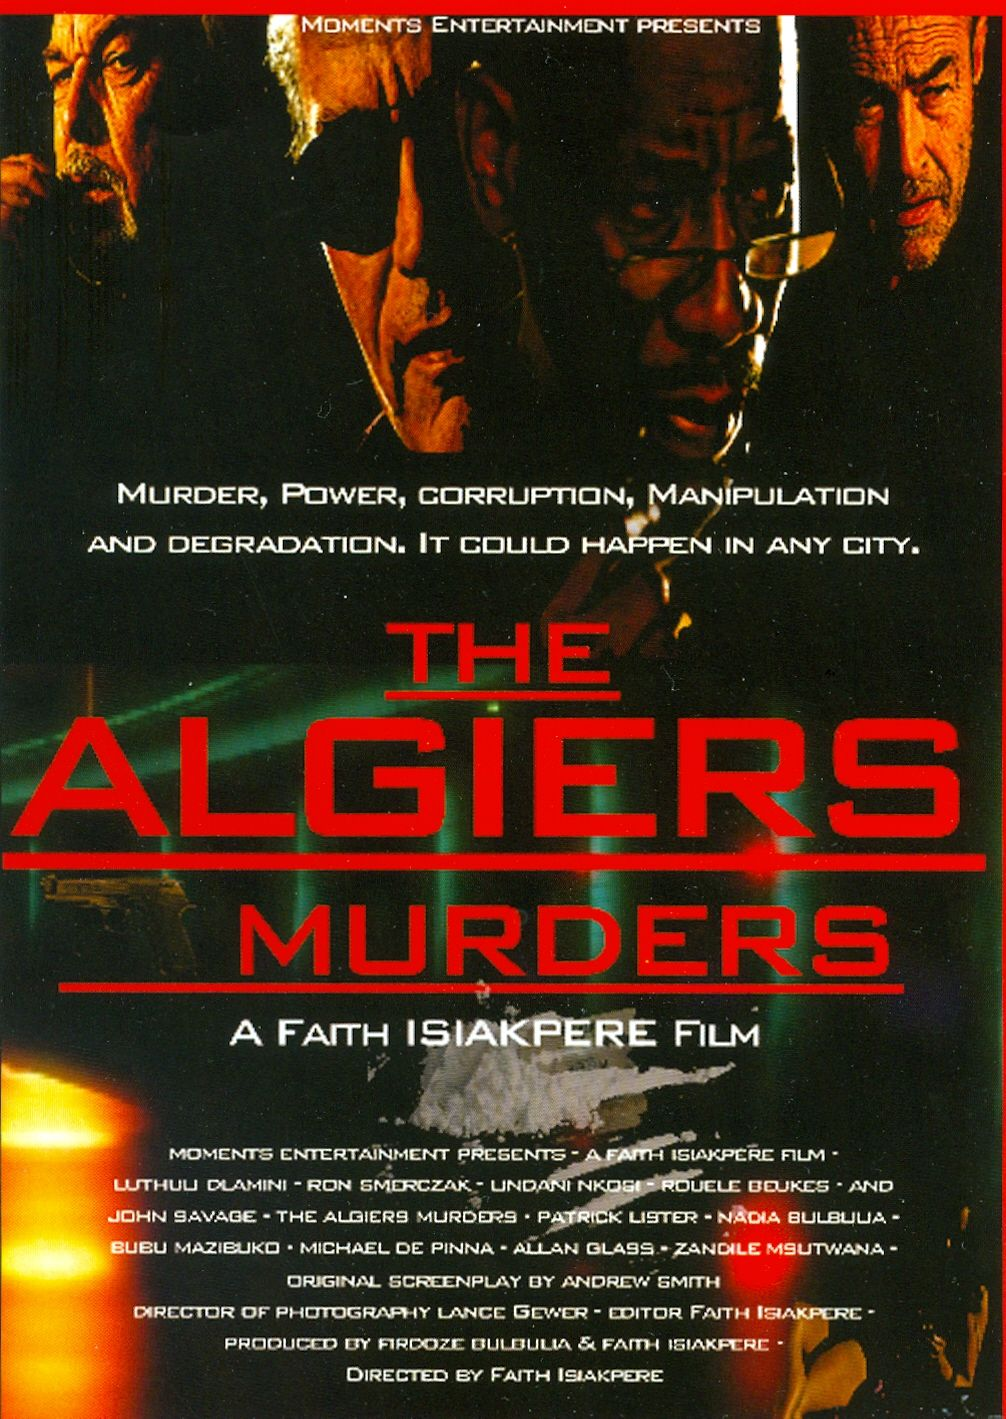 Algiers Murders